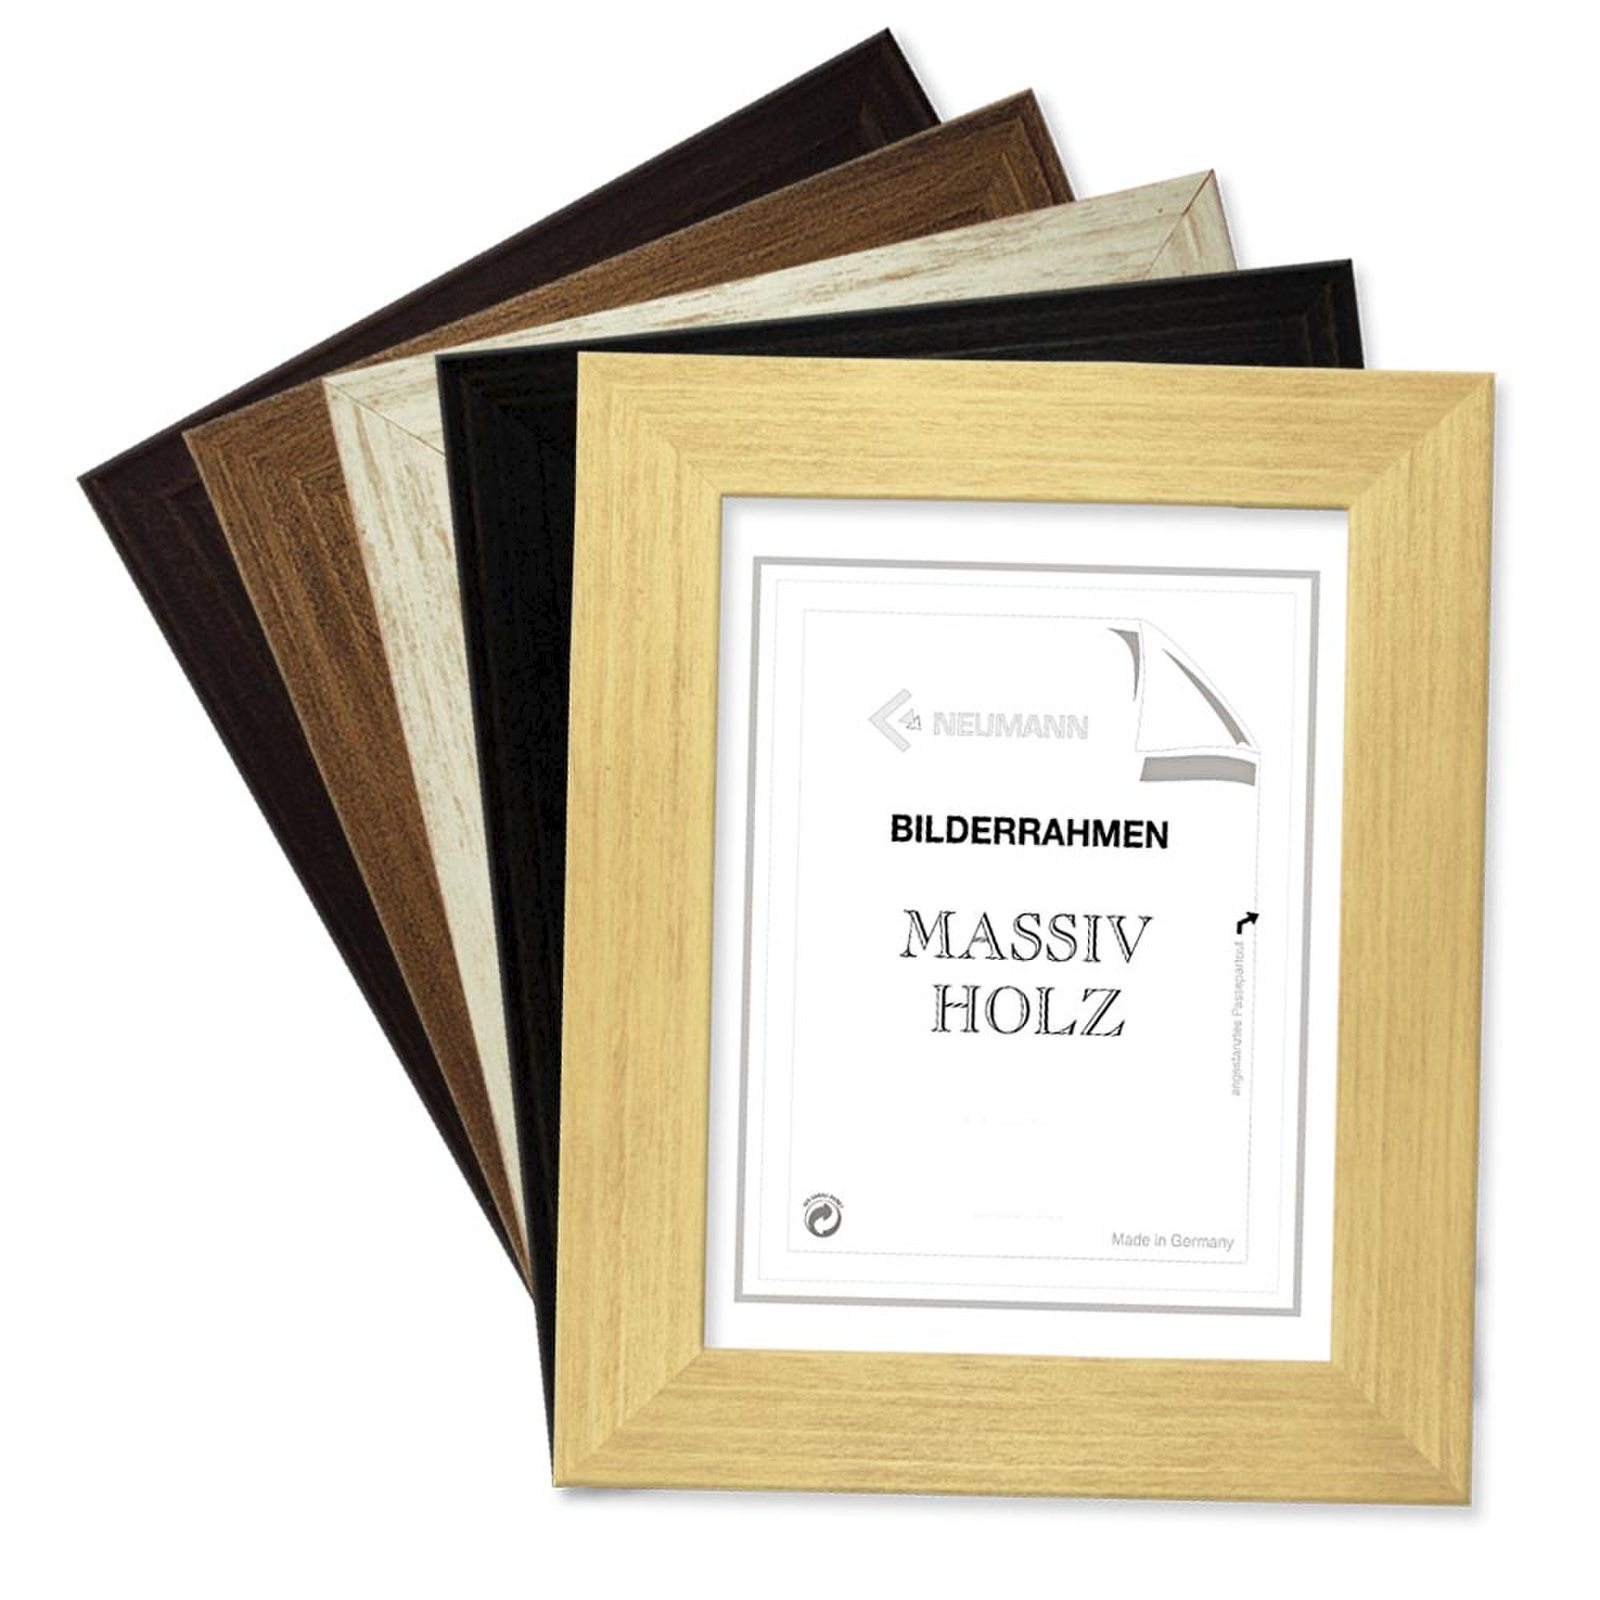 Holzrahmen COLORADO, in 5 matten Farben, Bilderrahmen Holz 40 mm | eBay